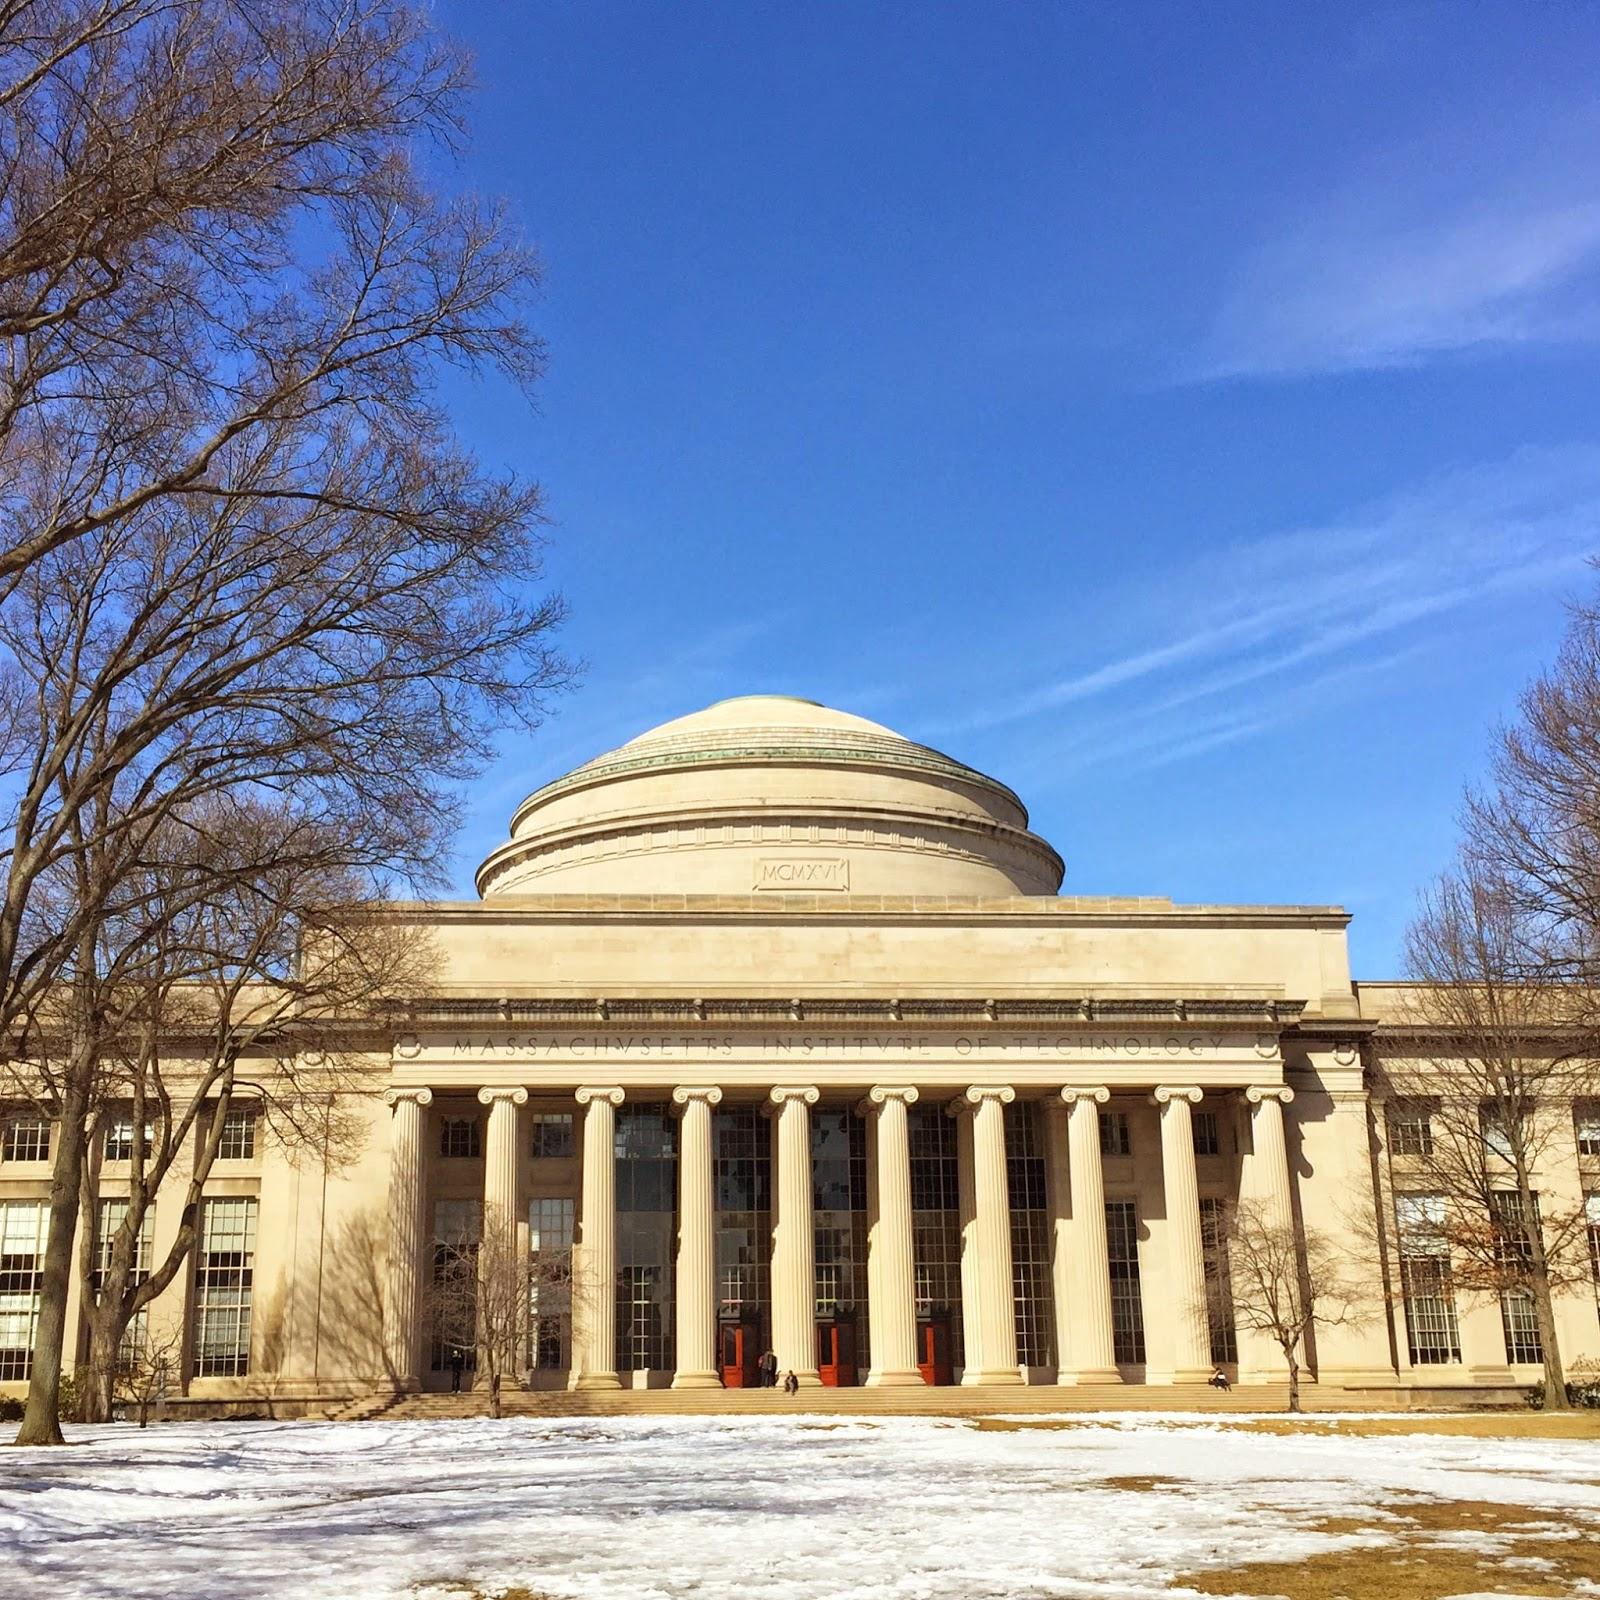 Foodie in Travel: [美國波士頓Boston] 哈佛與麻省理工學院景點總整理